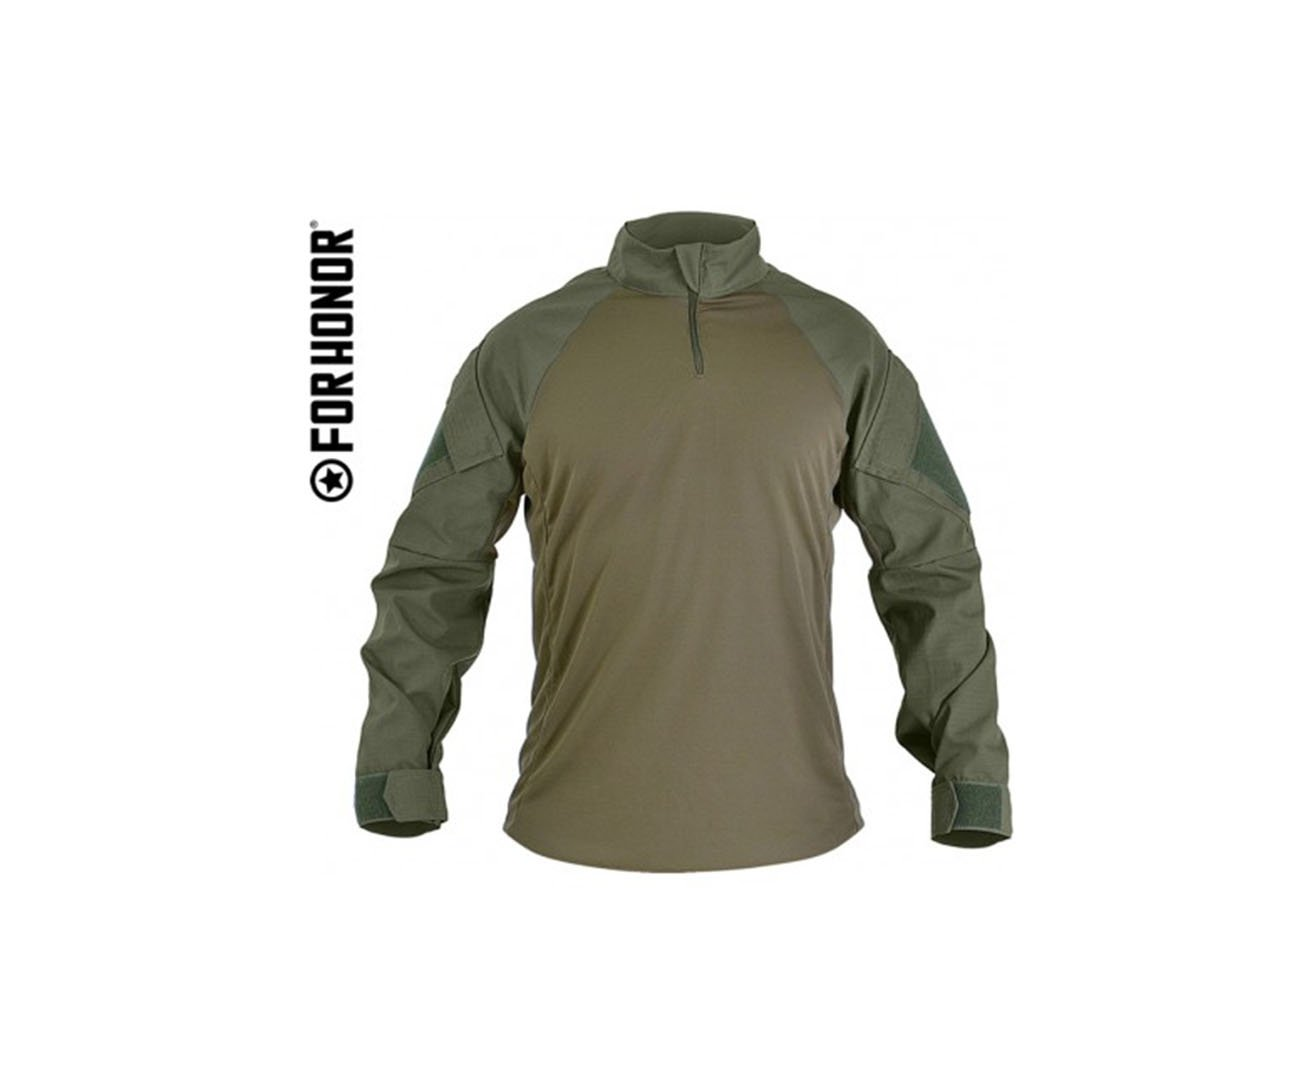 Camisa De Combate 711 Olive Drab (combat Shirt)- Forhonor